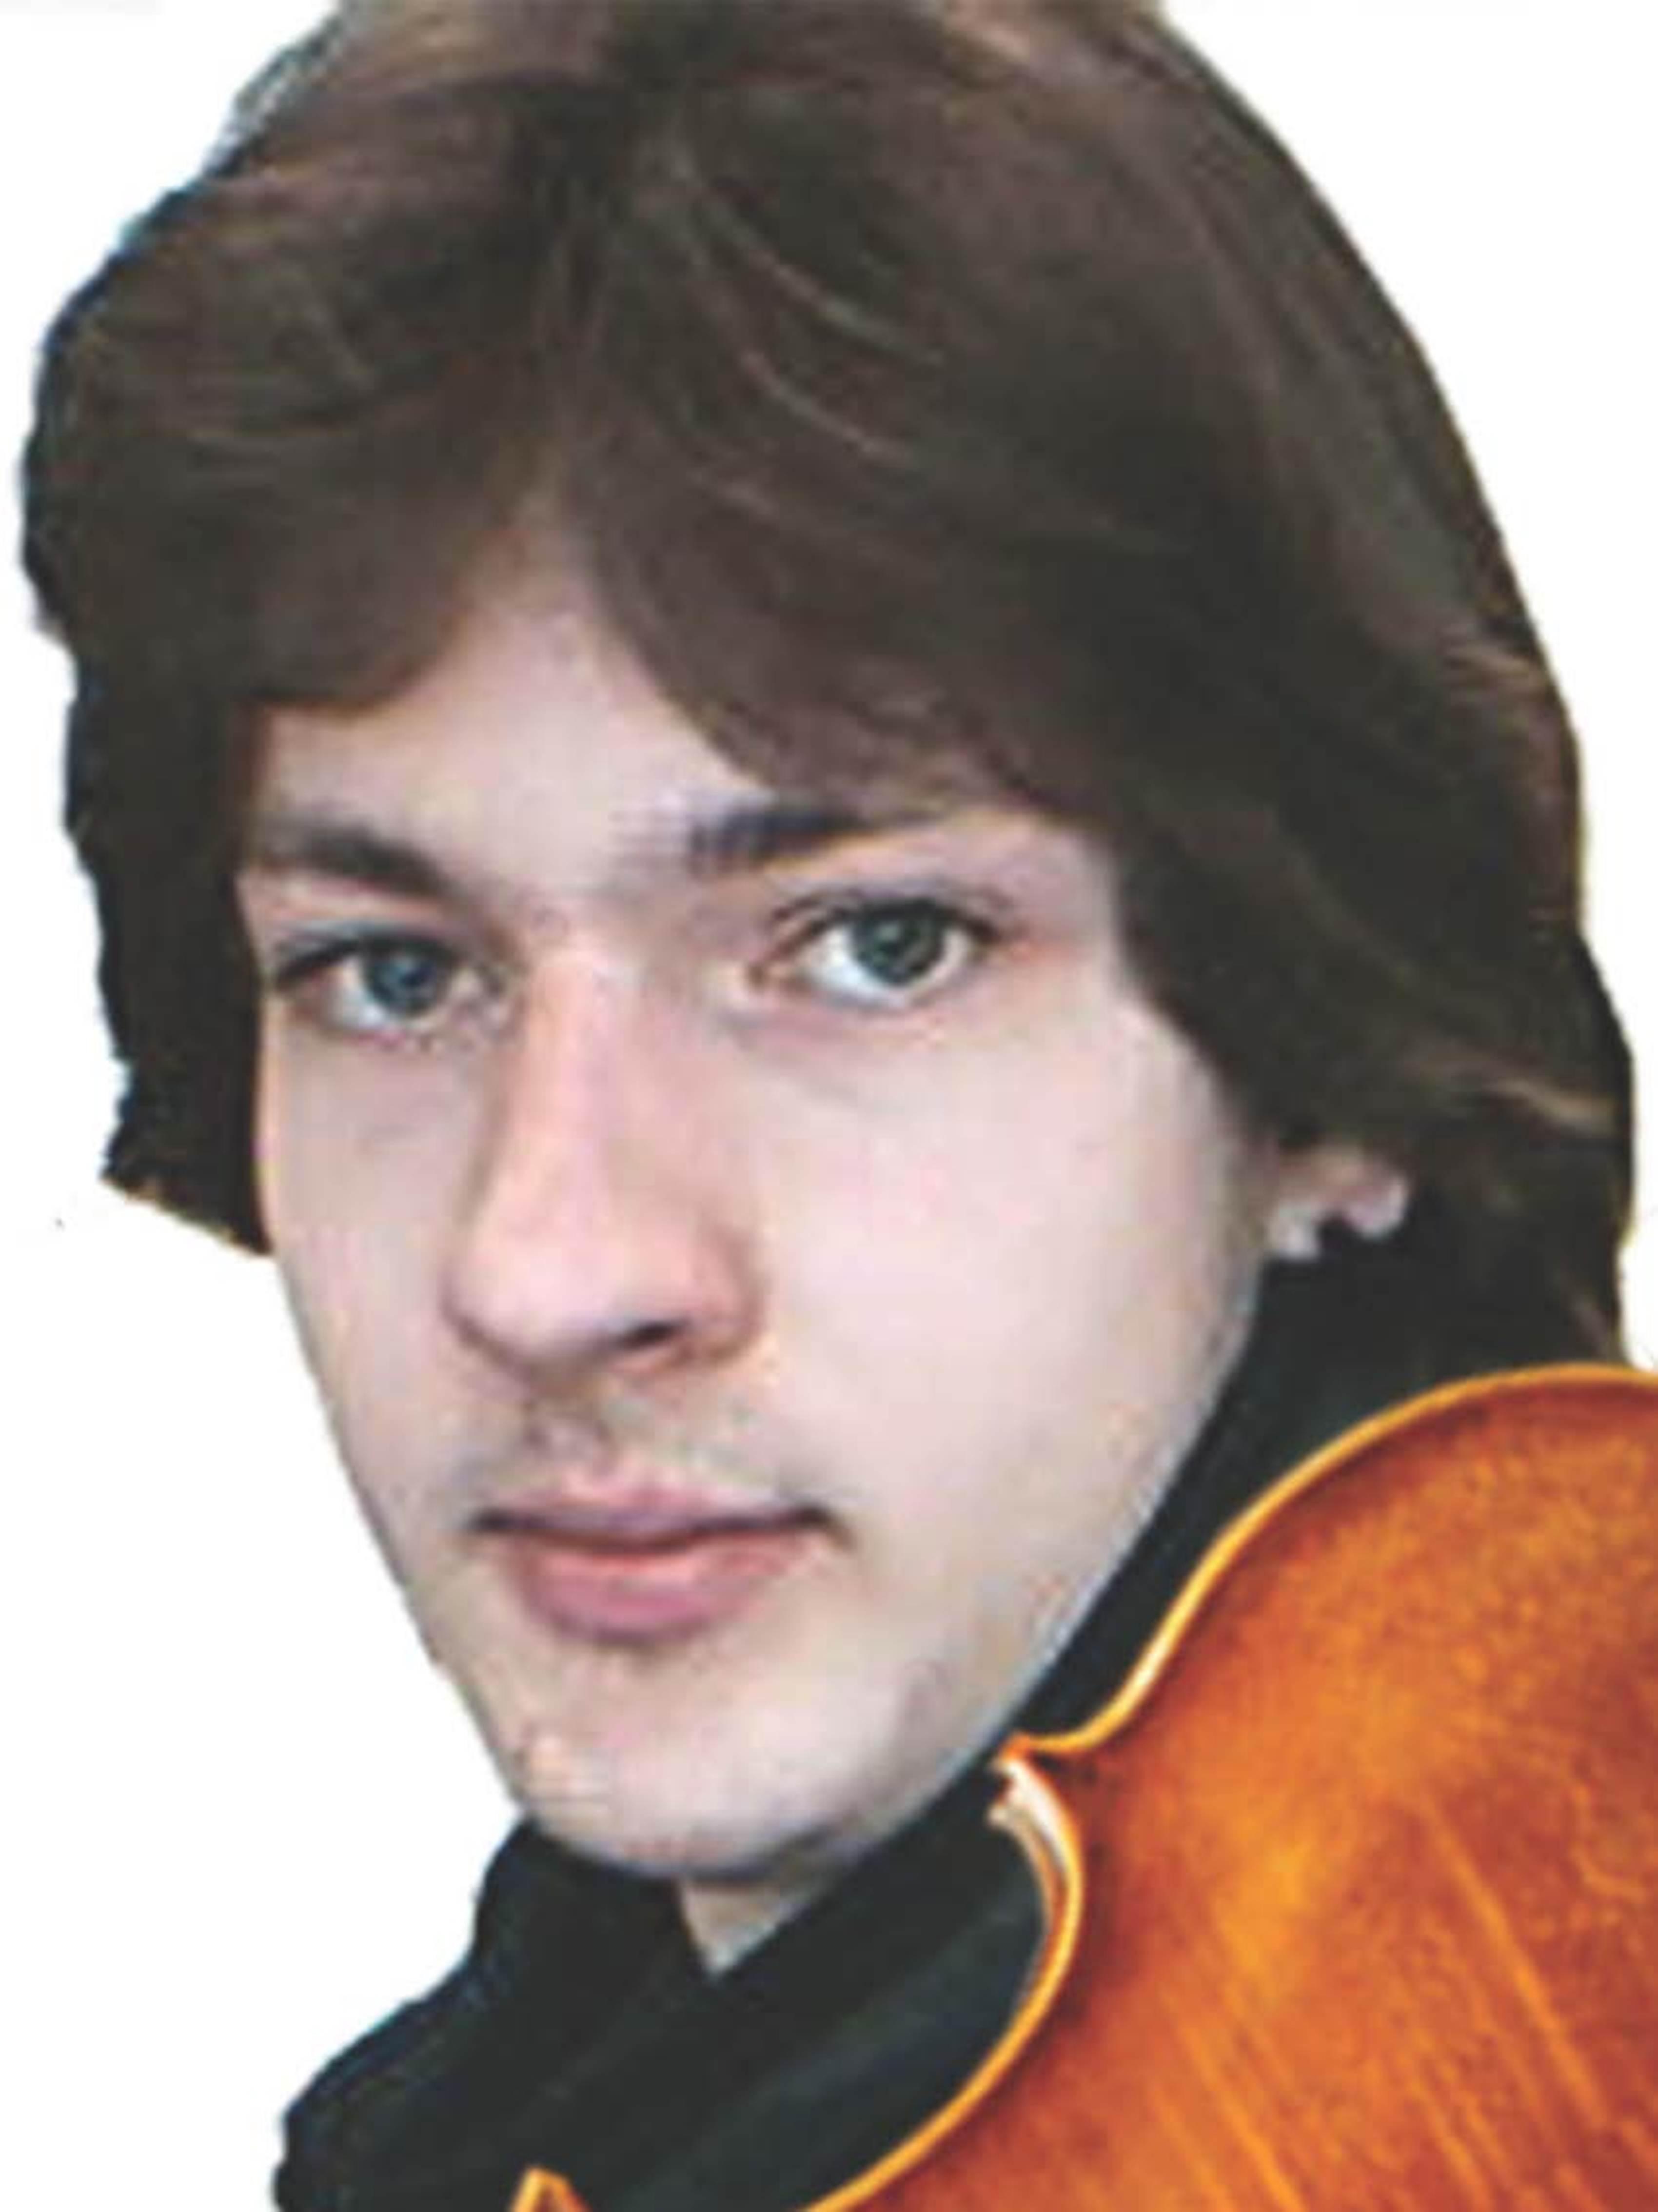 Oleksandr Pushkarenko